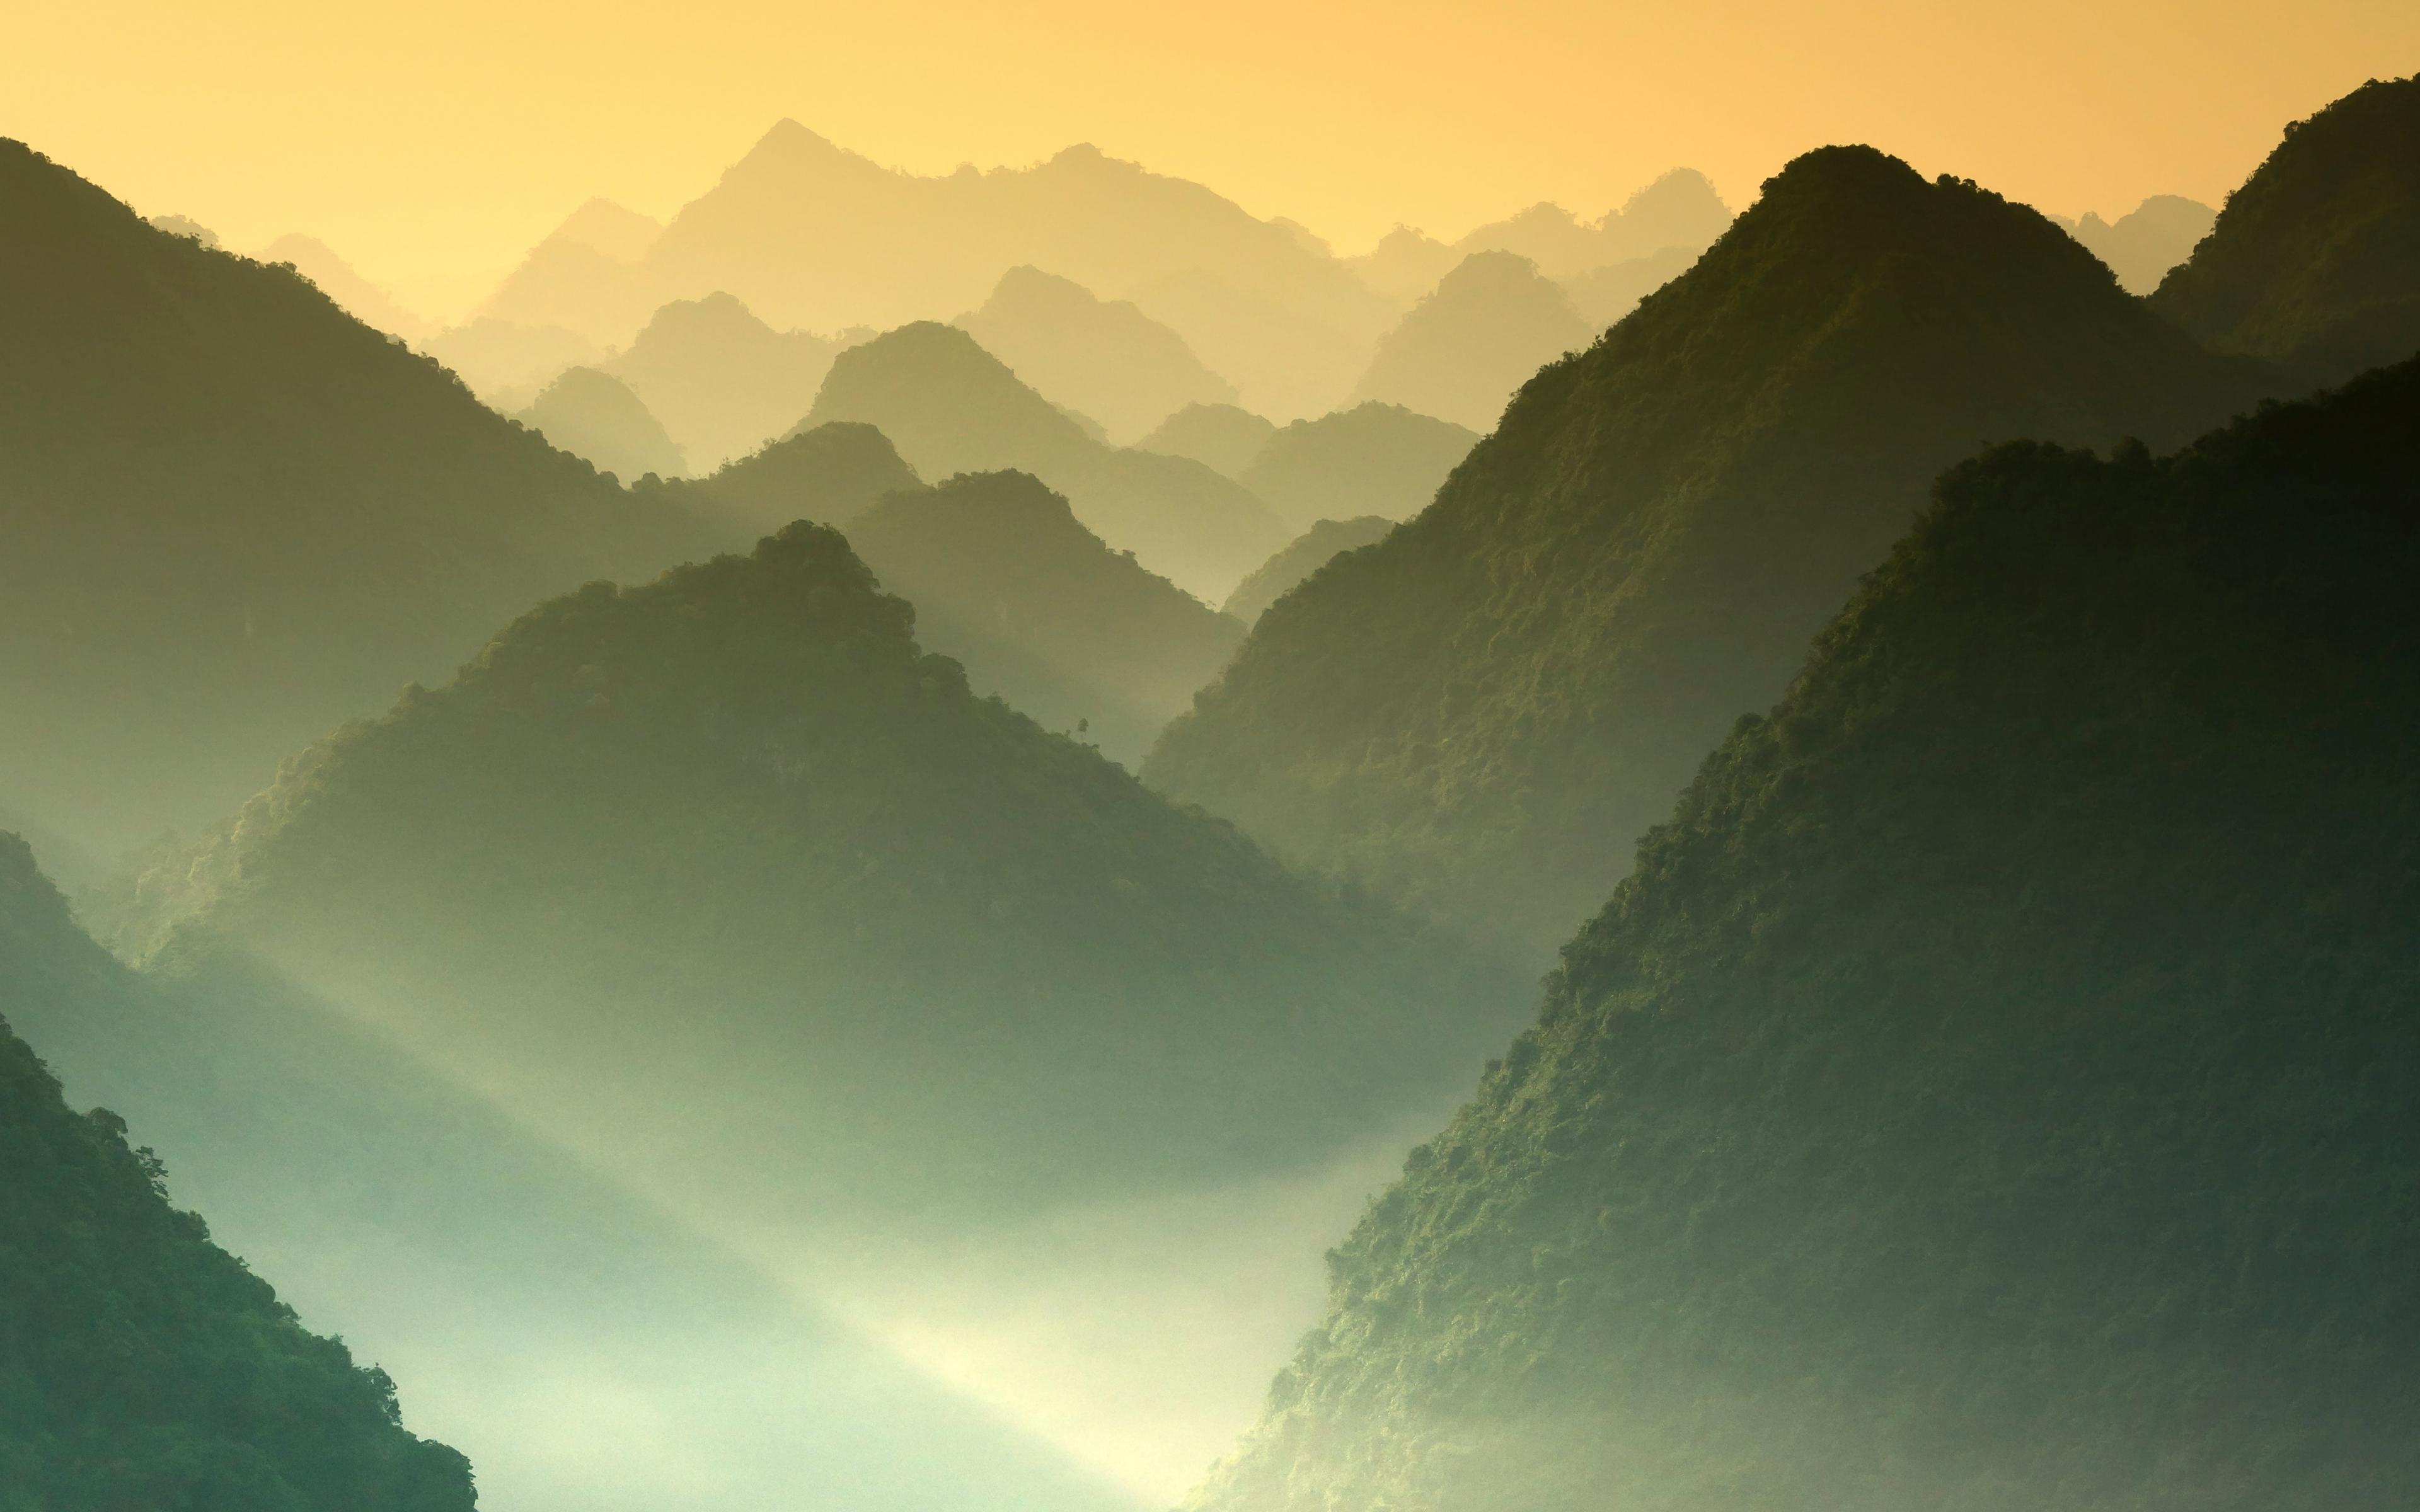 Download 3840x2400 Wallpaper Mountains Sunrise Nature